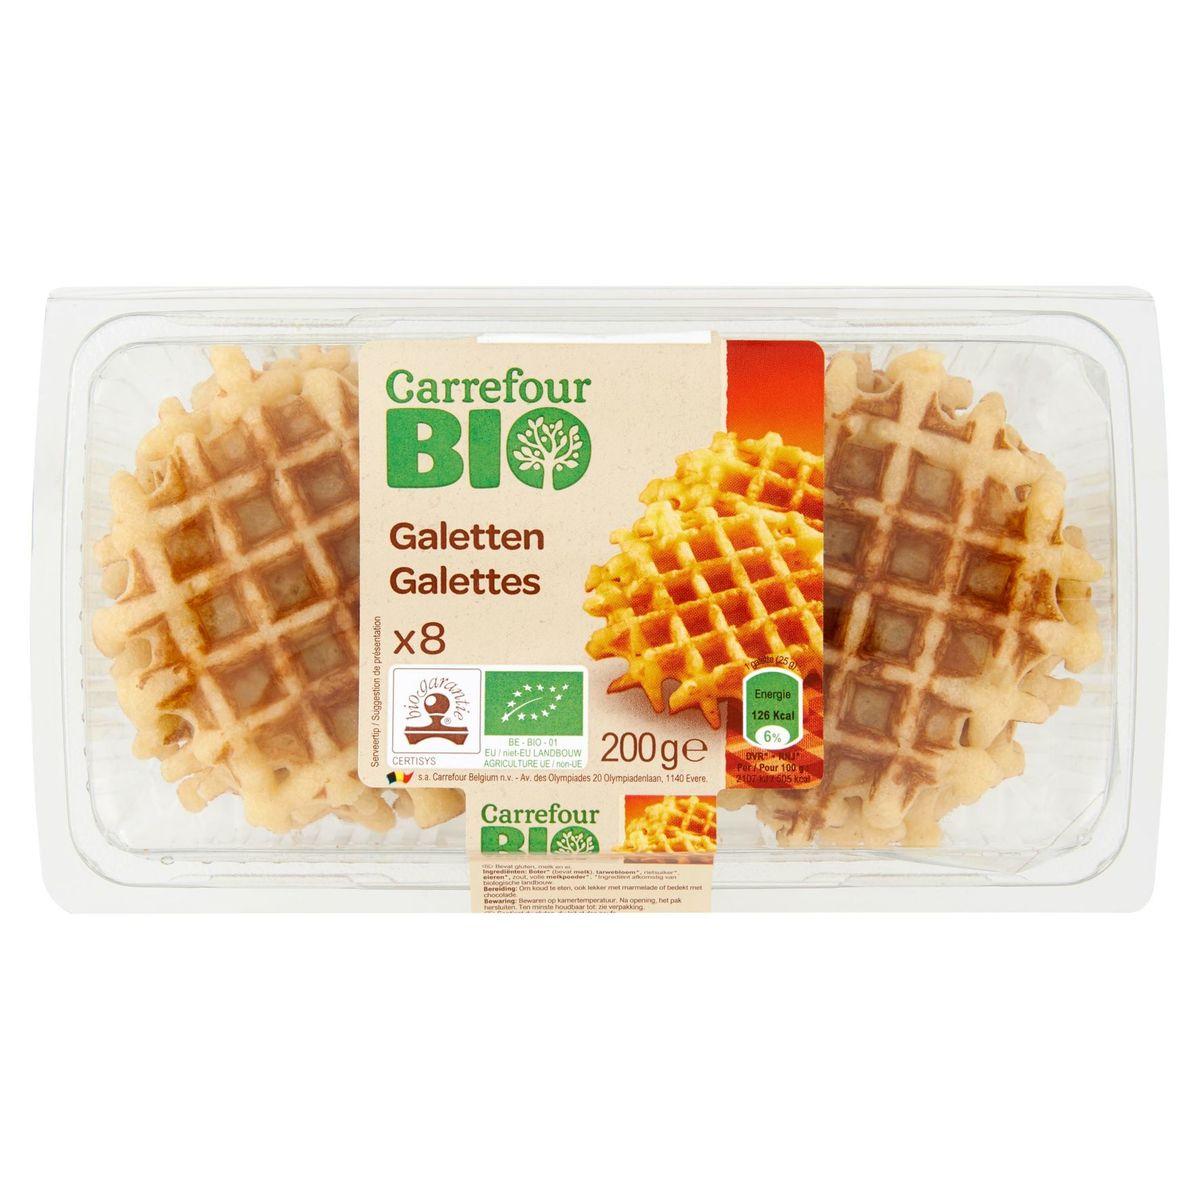 Carrefour Bio 8 Galettes 200 g